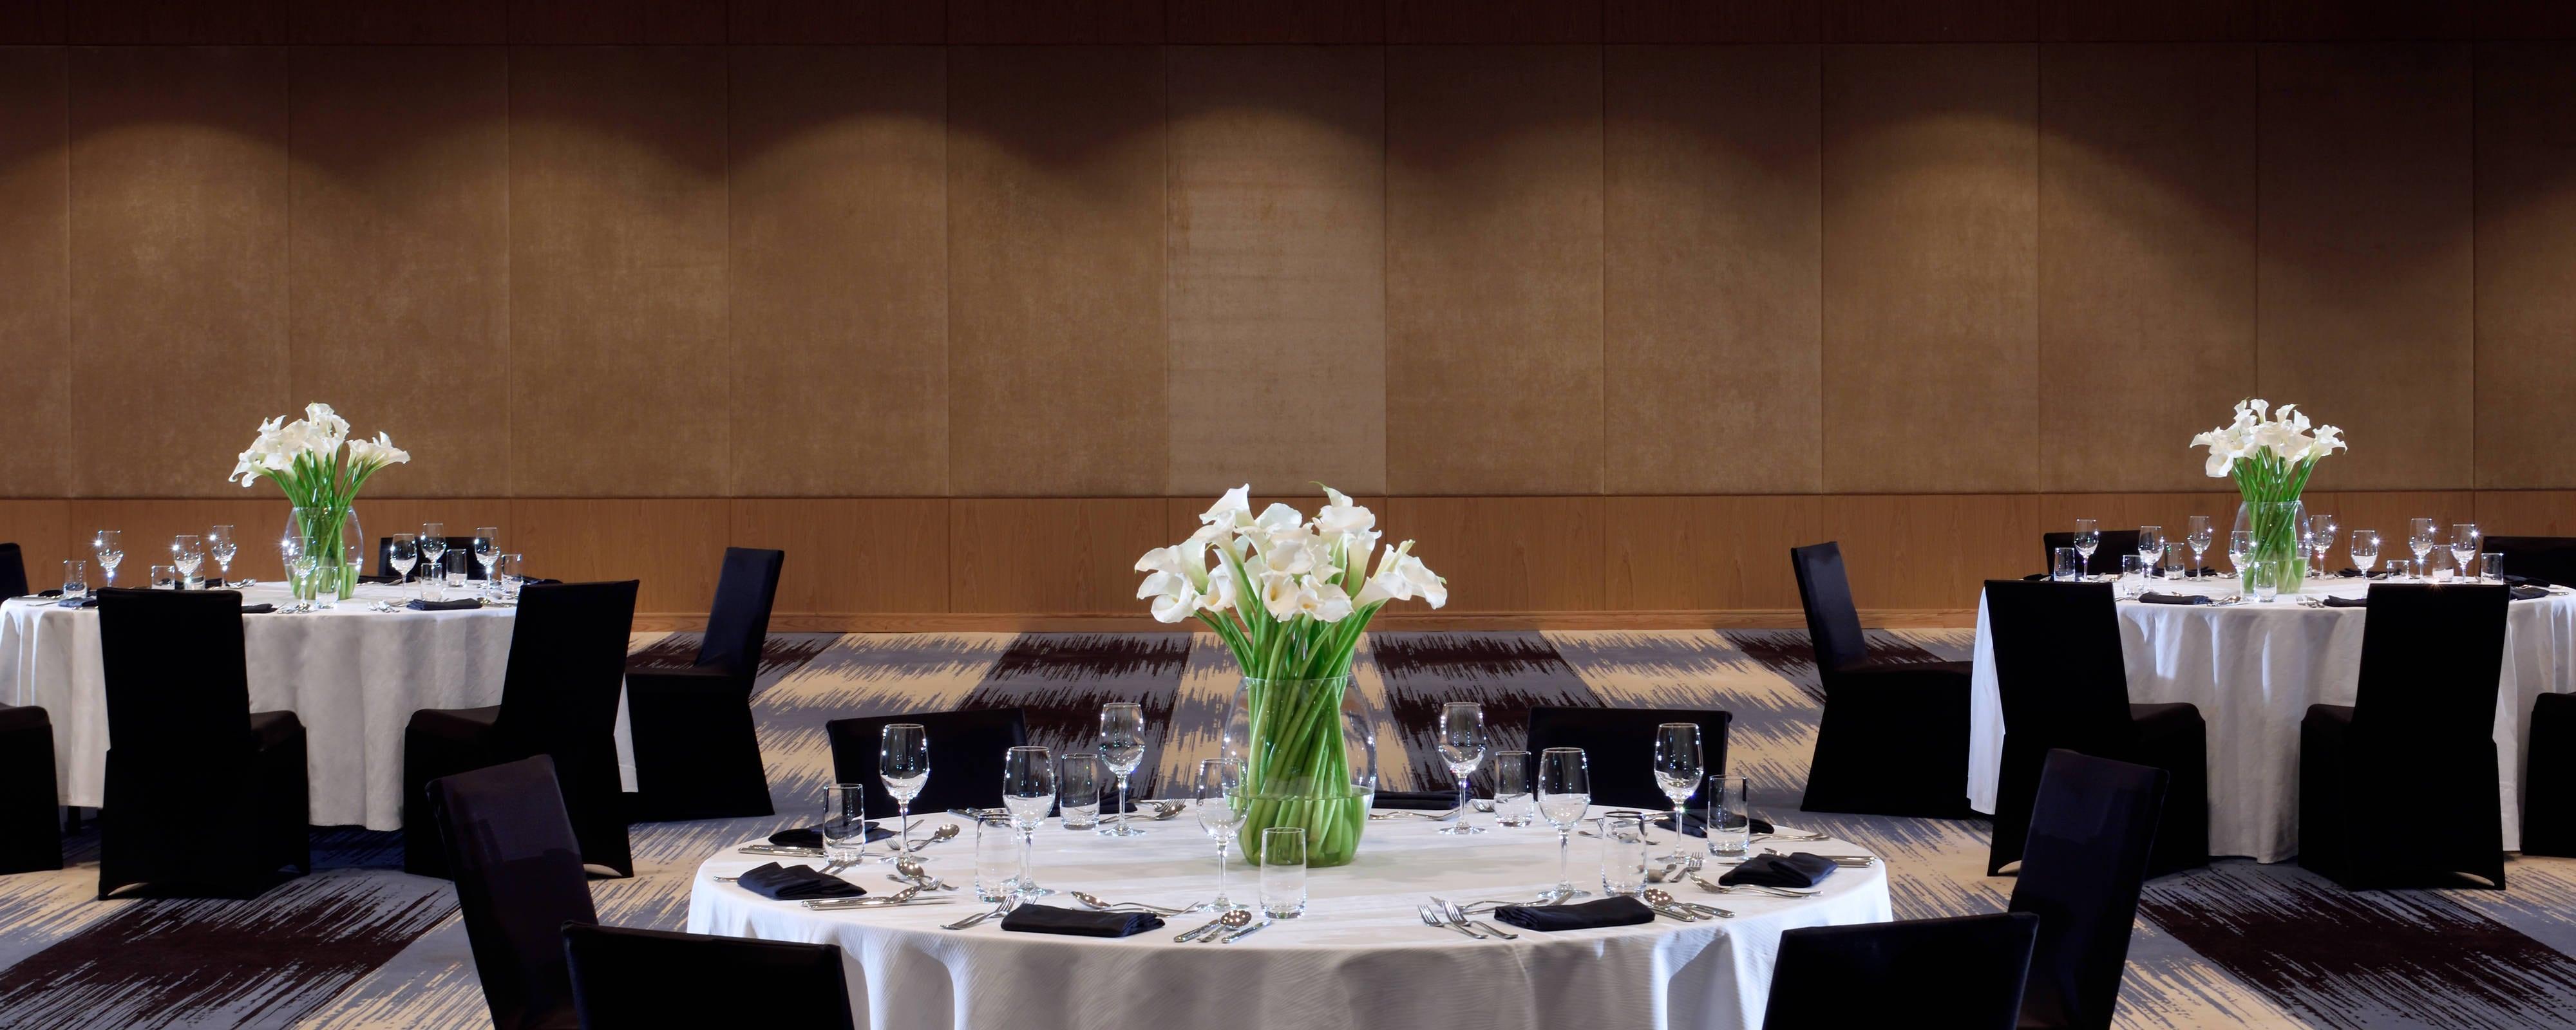 Wedding venues in kigali kigali marriott hotel junglespirit Choice Image